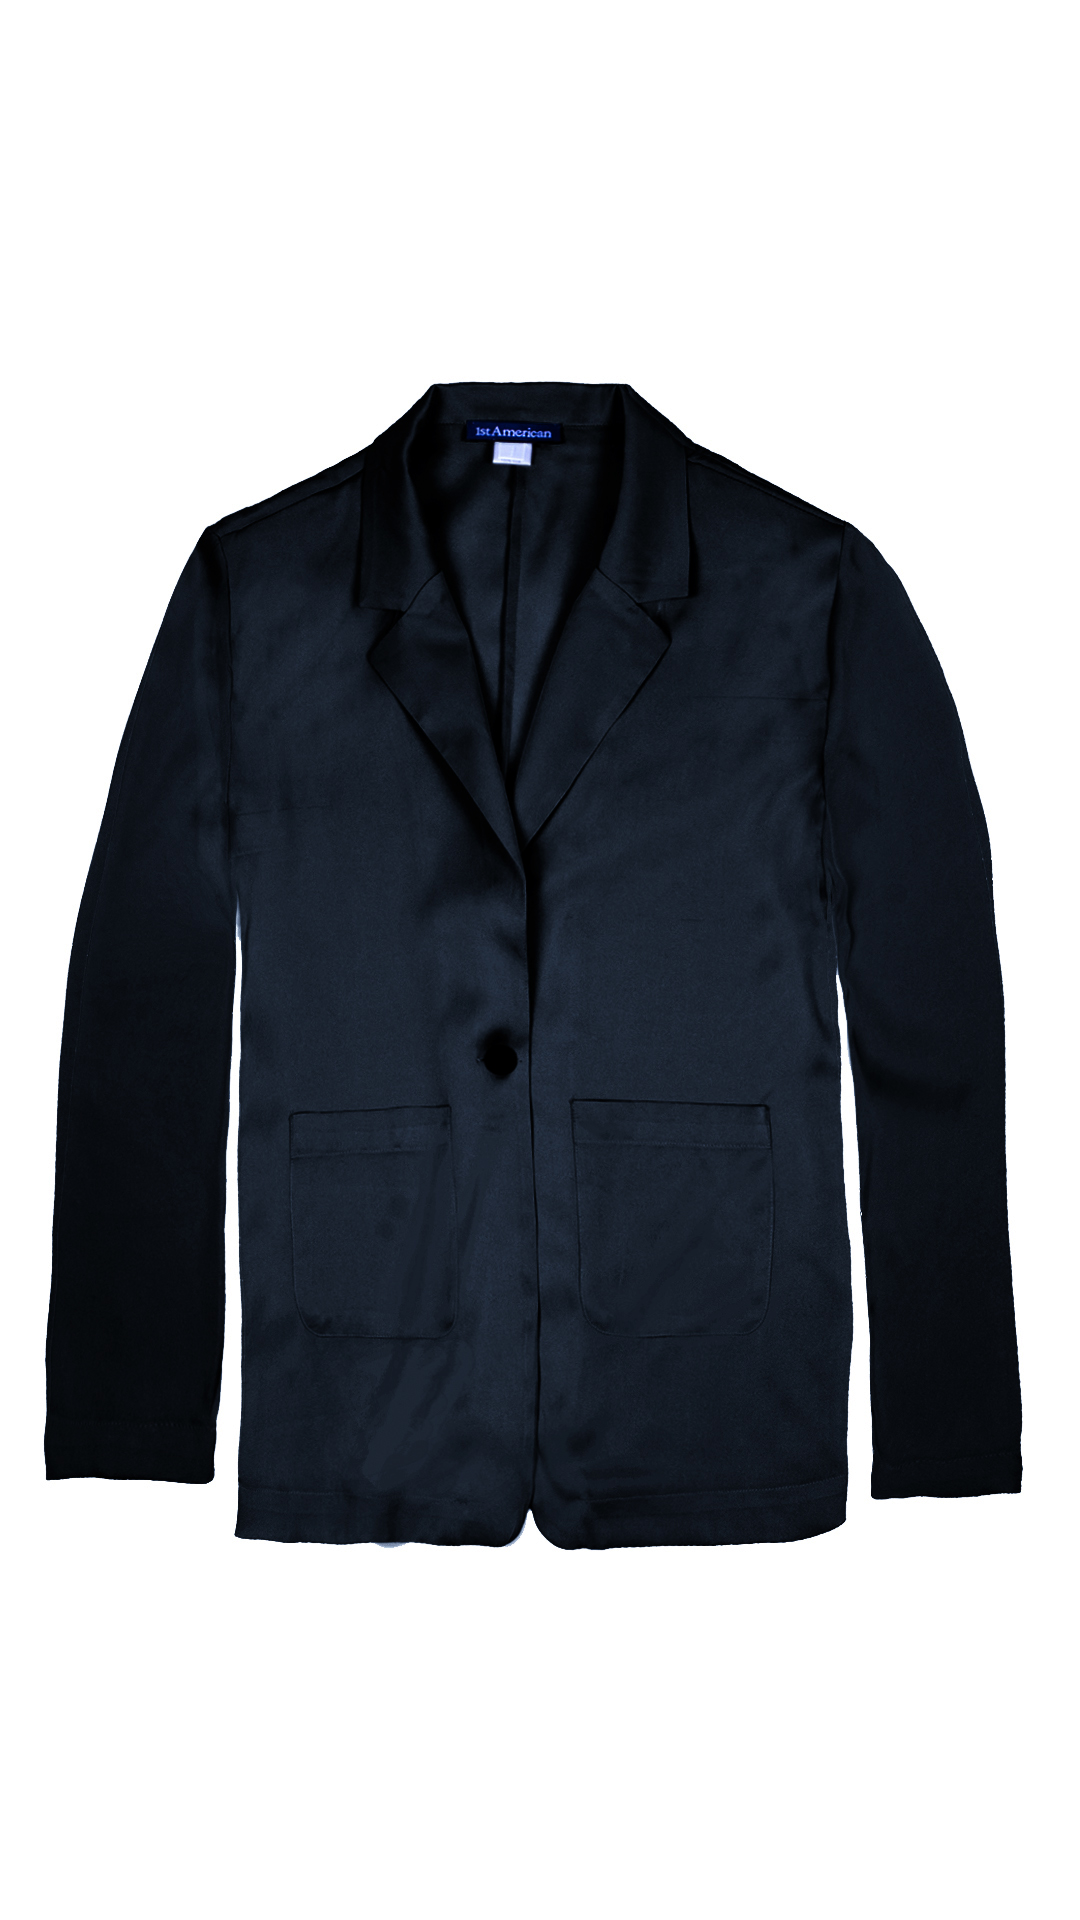 GIASILK01 NERO GIACCA DONNA MANICA LUNGA 3 1stAmerican giacca da donna 100% pura seta manica 3/4 - elegante camicia in seta da donna